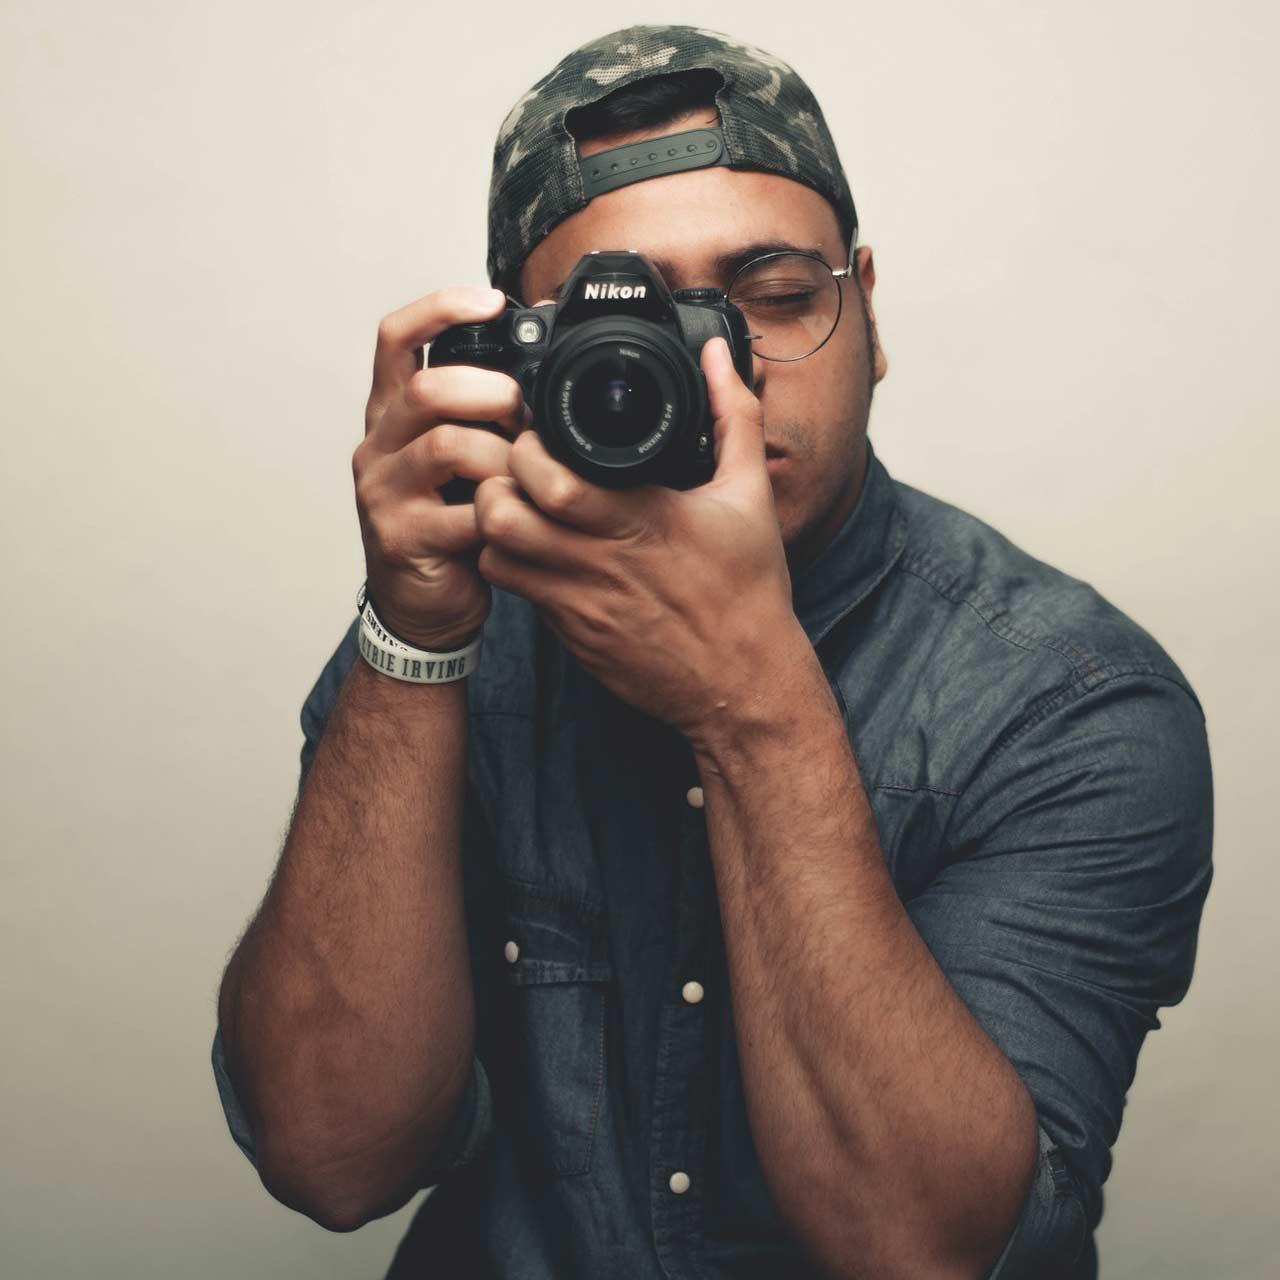 man-holding-camera-2941569